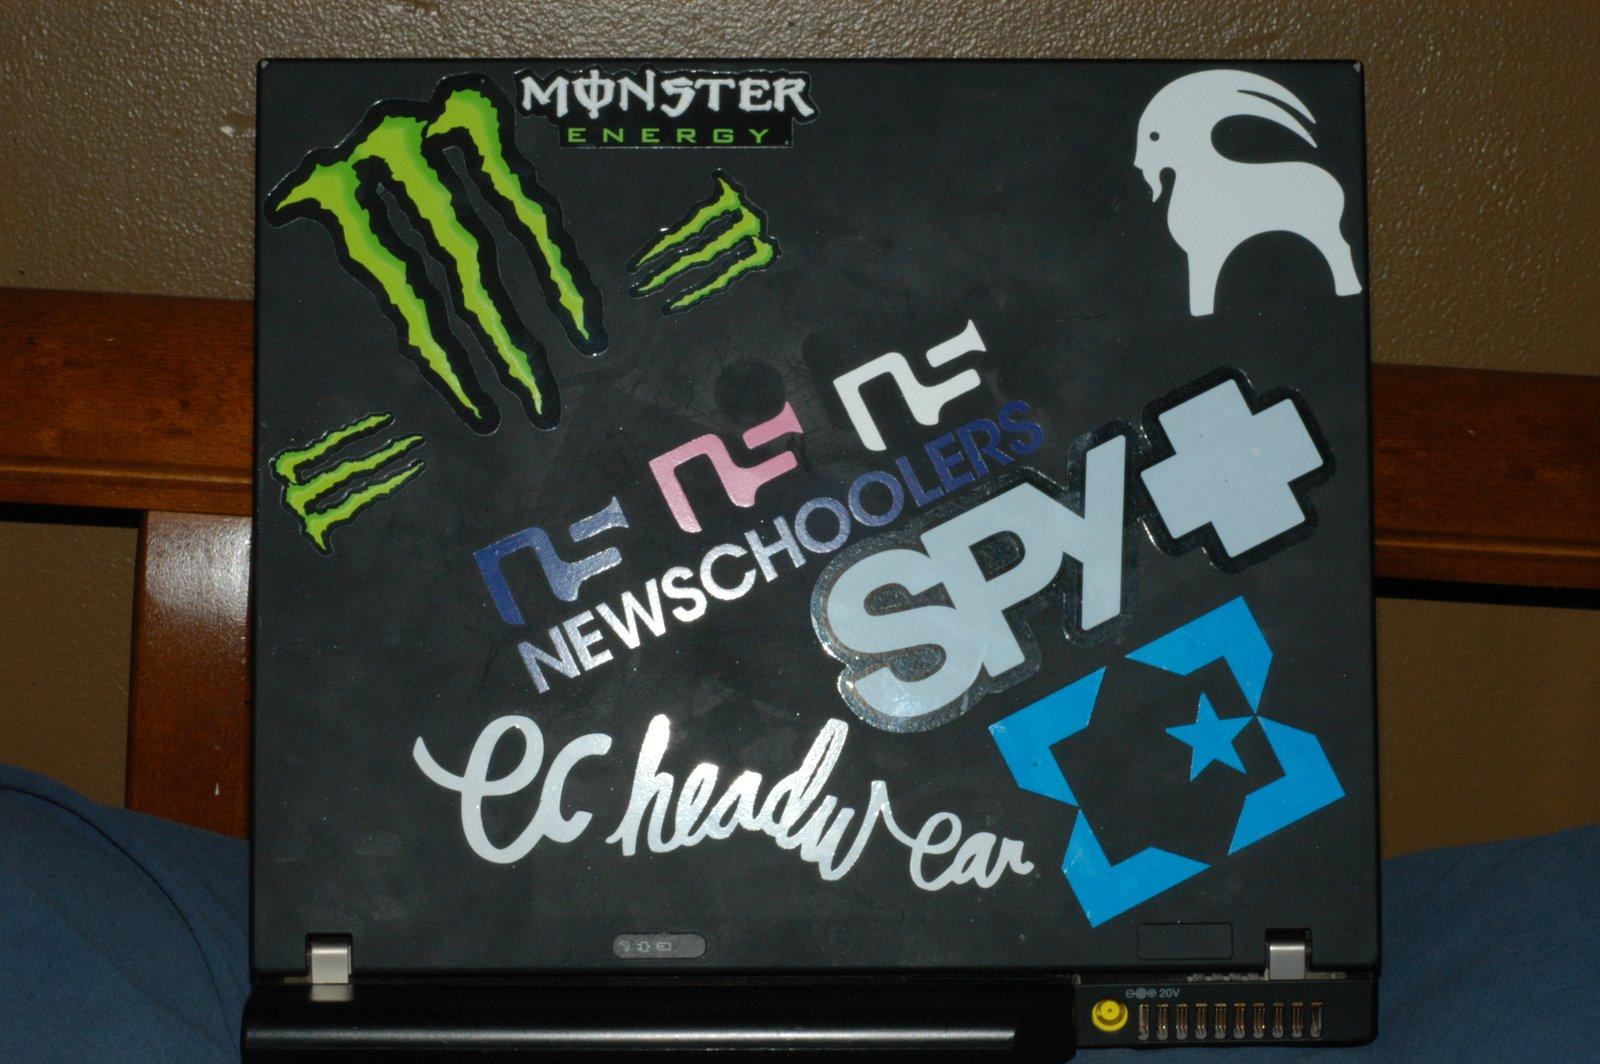 New Laptop stickers